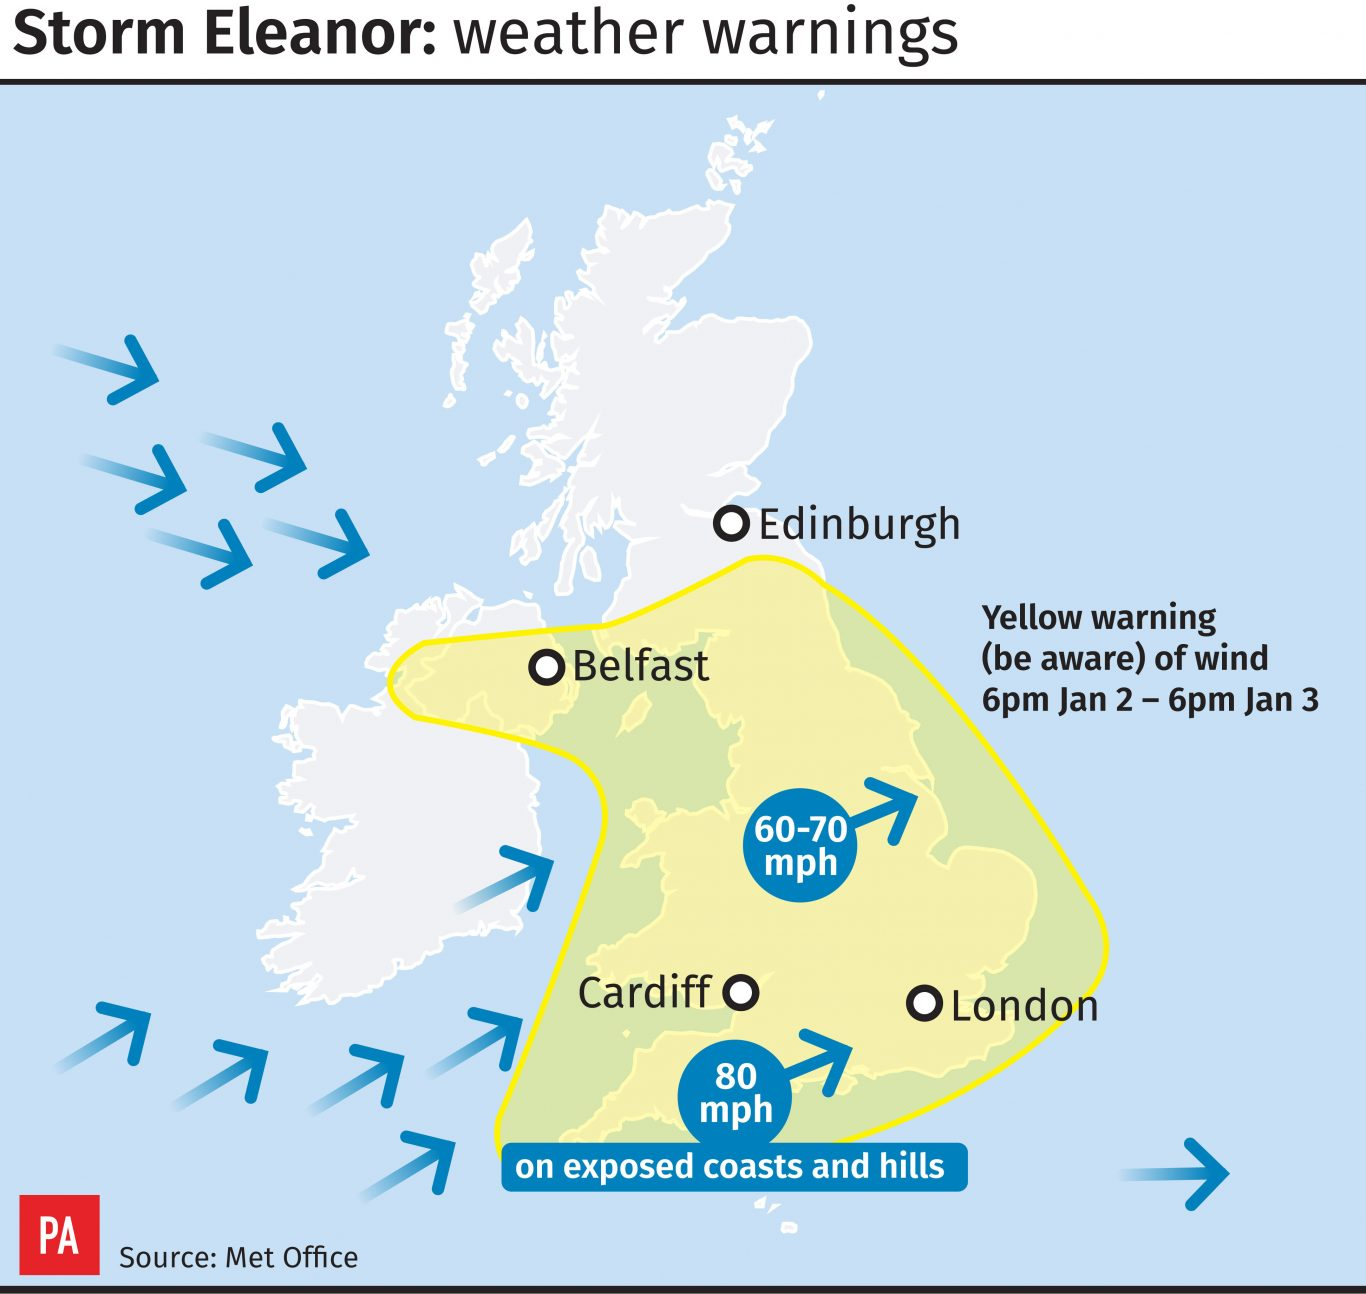 Storm Eleanor weather warnings